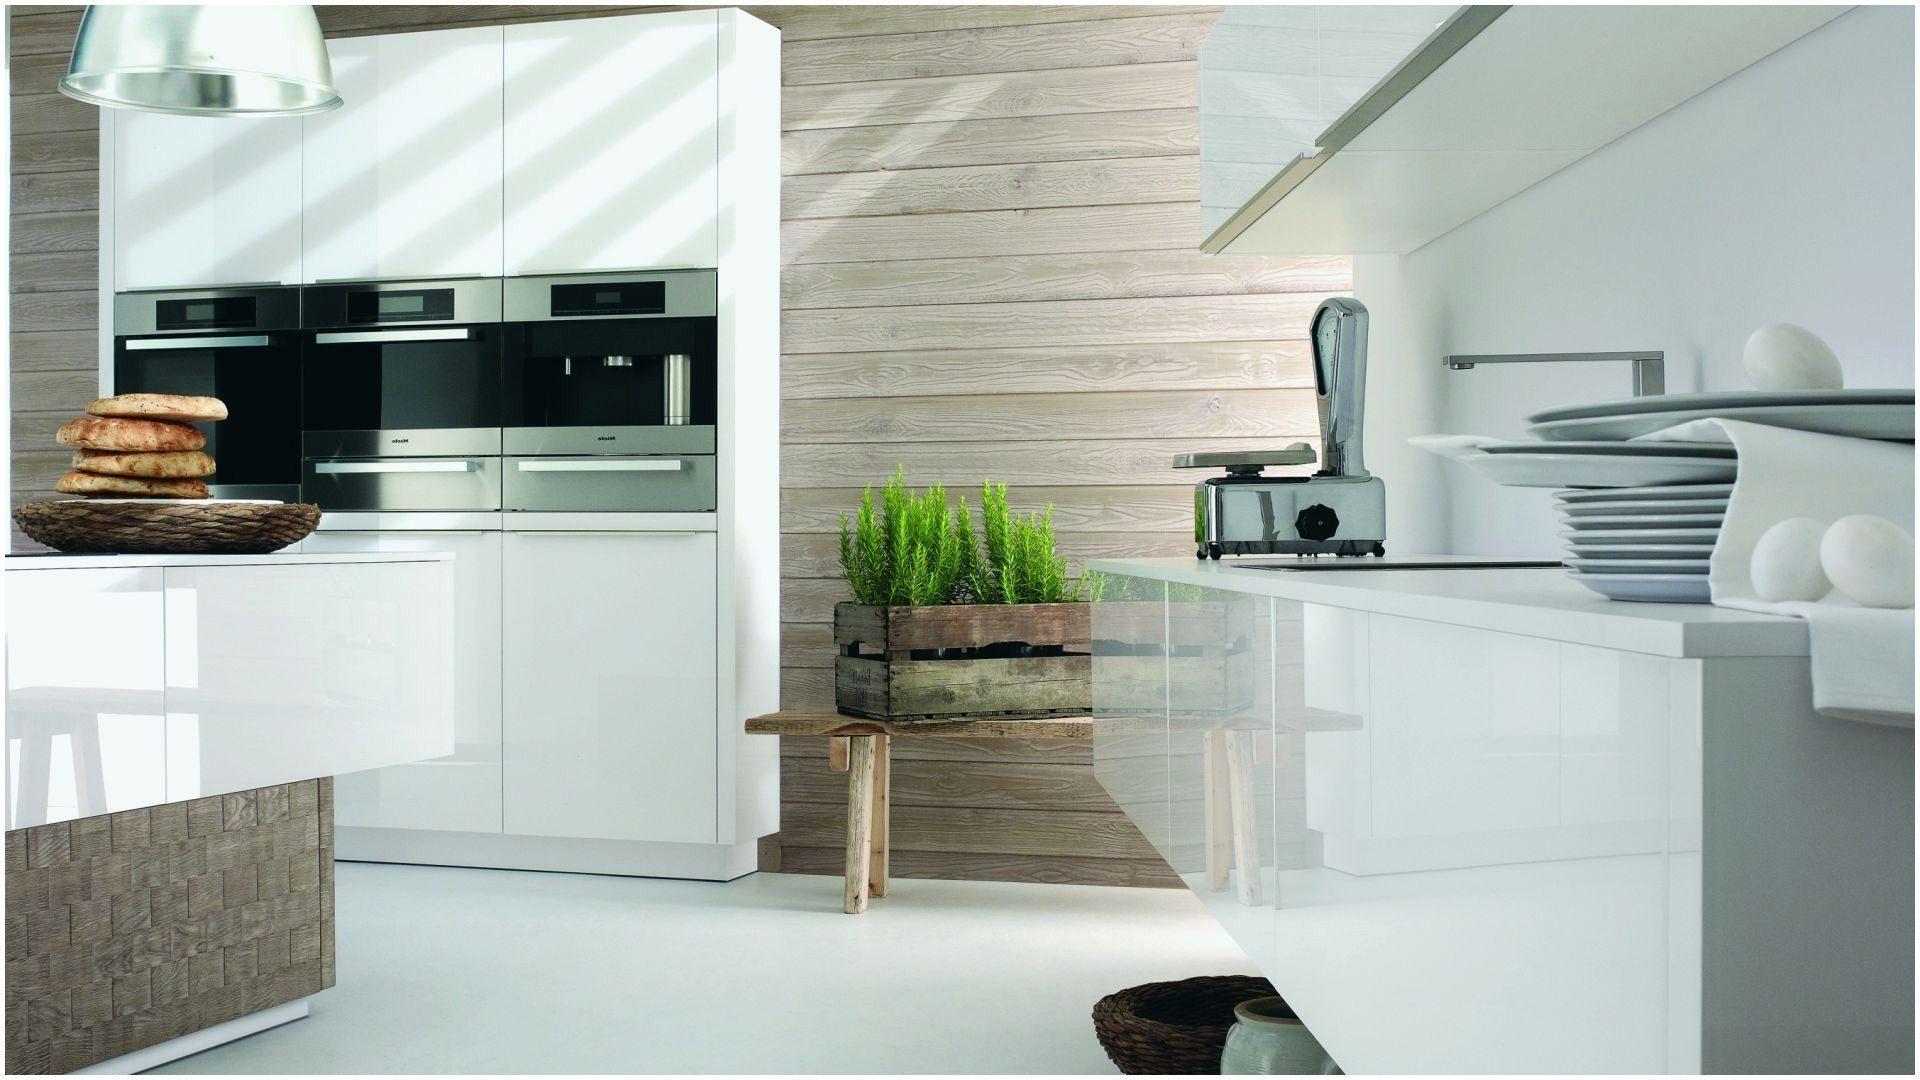 Lit Meuble Ikea Frais Meuble Colonne Cuisine Ikea Meuble Pour Frigo Luxe Meuble Colonne